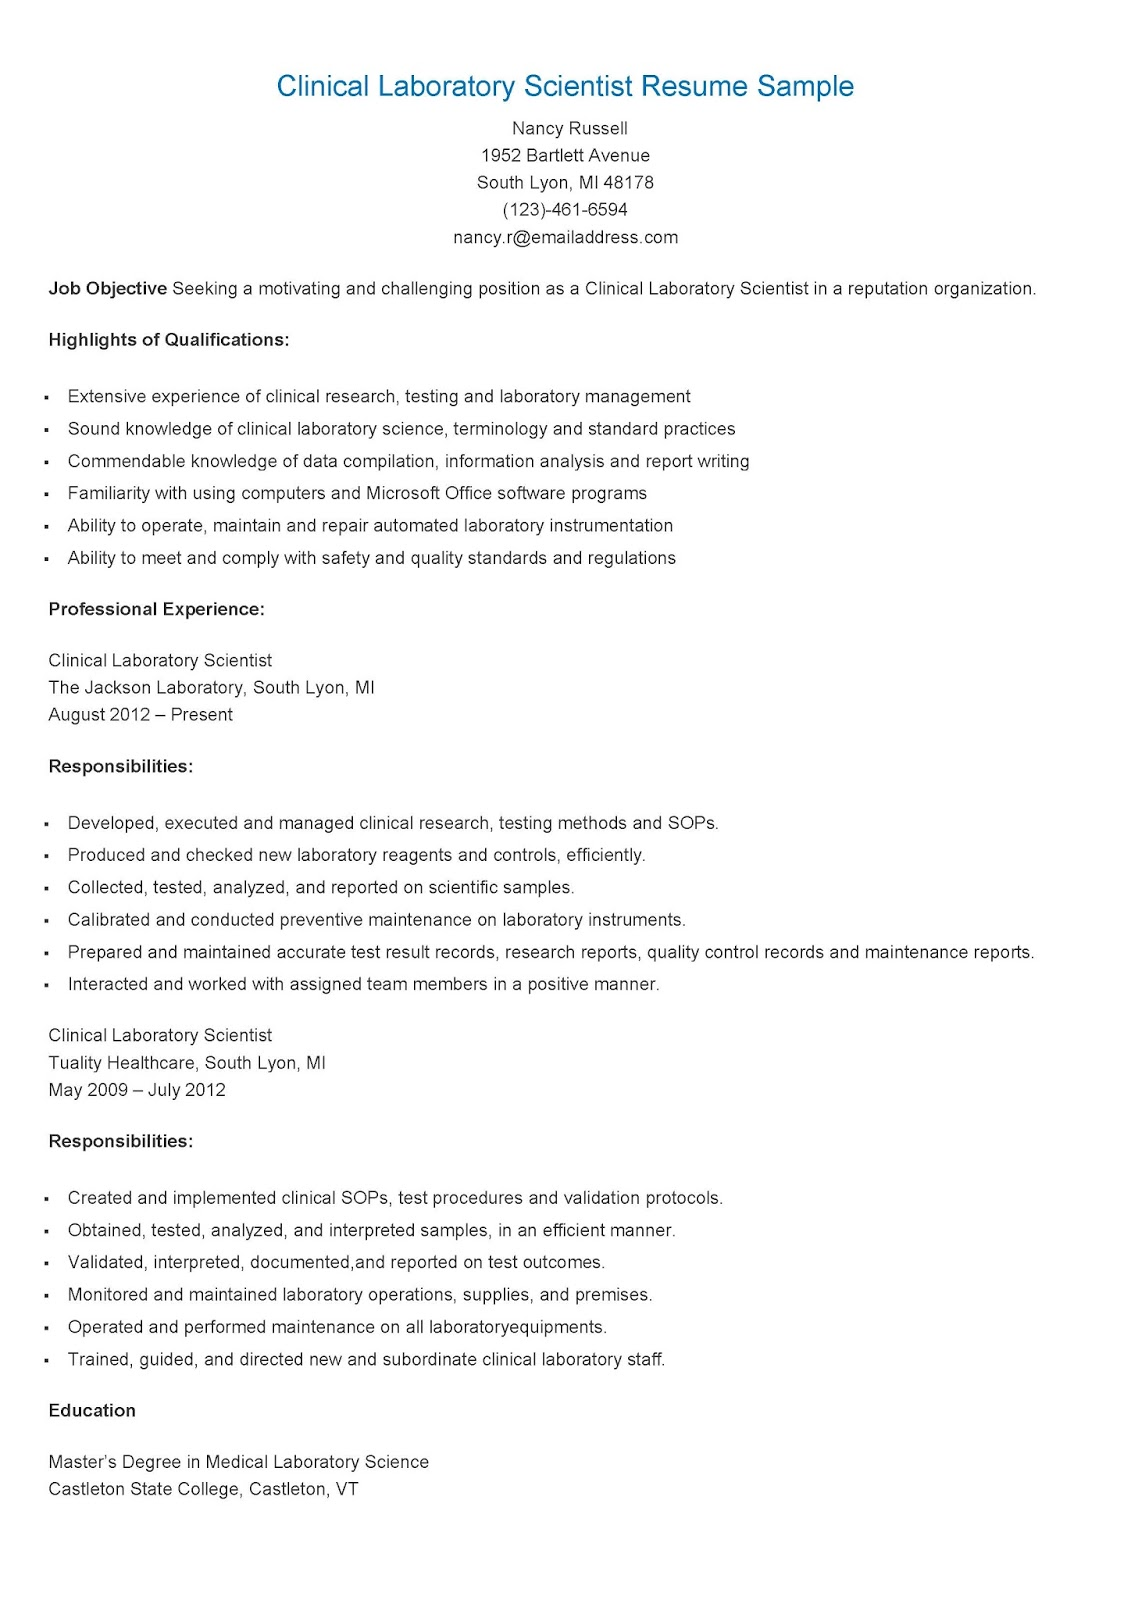 sample resume medical laboratory scientist